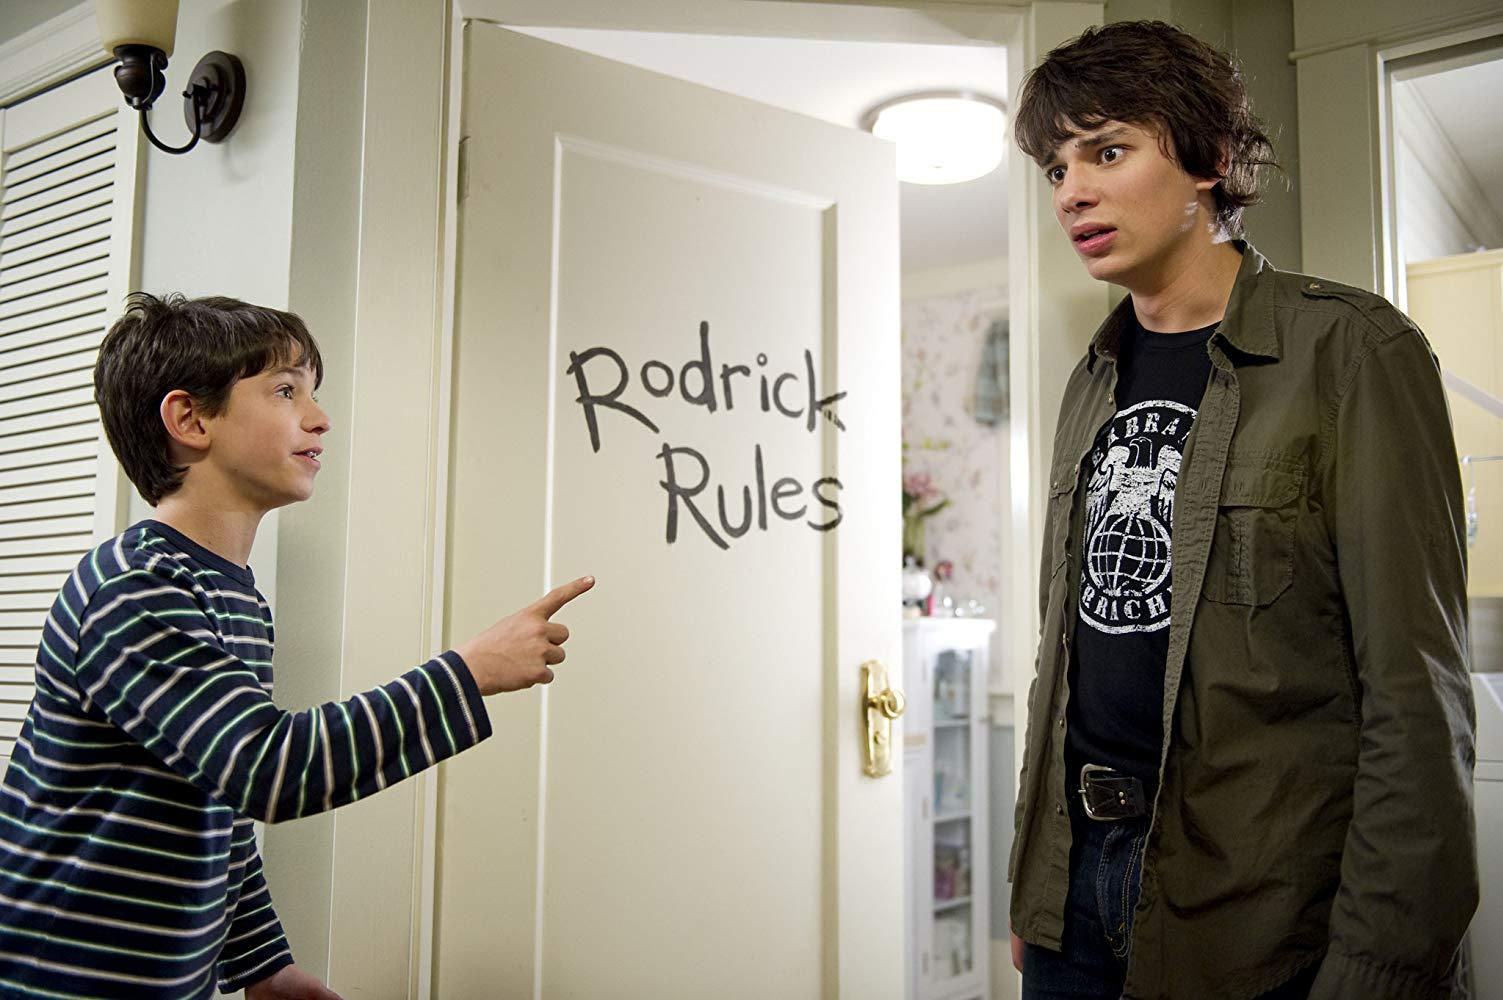 مشاهدة فيلم Diary Of A Wimpy Kid Rodrick Rules 2011 HD مترجم كامل اون لاين